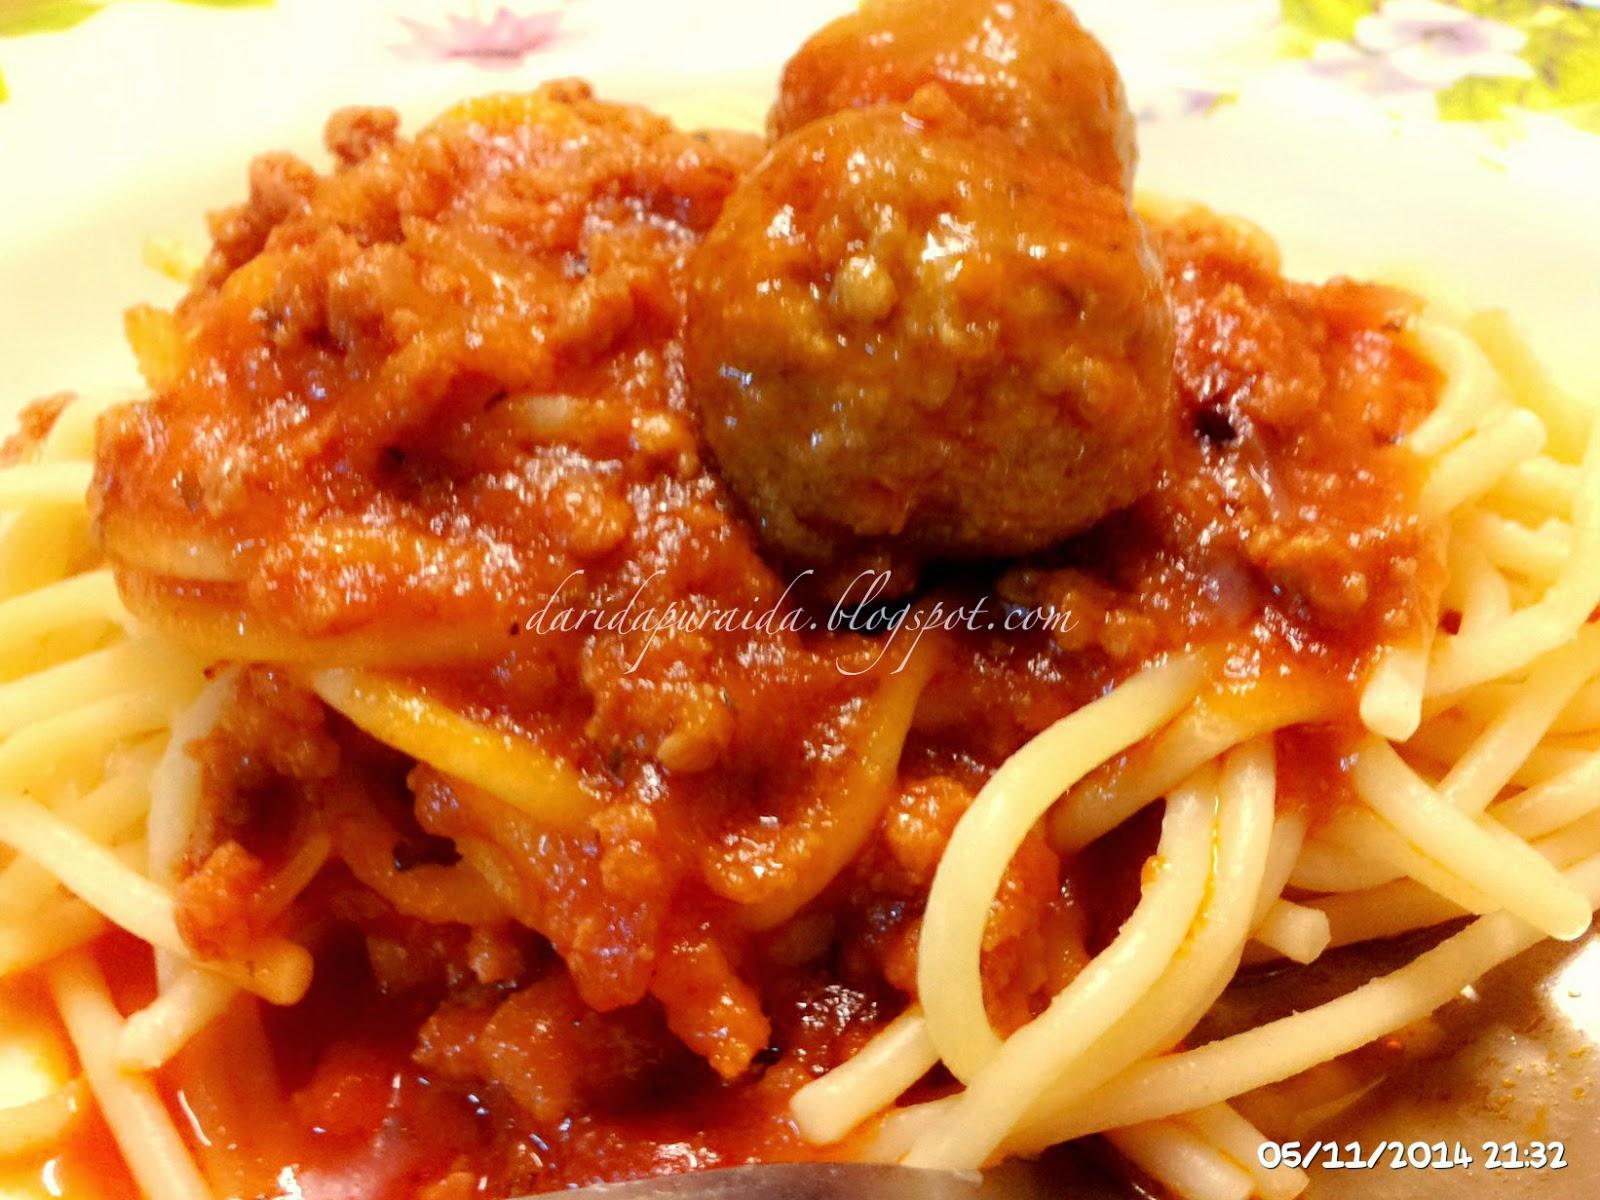 bahan bahan sepeket spaghetti 2 tin sos spaghetti aida guna